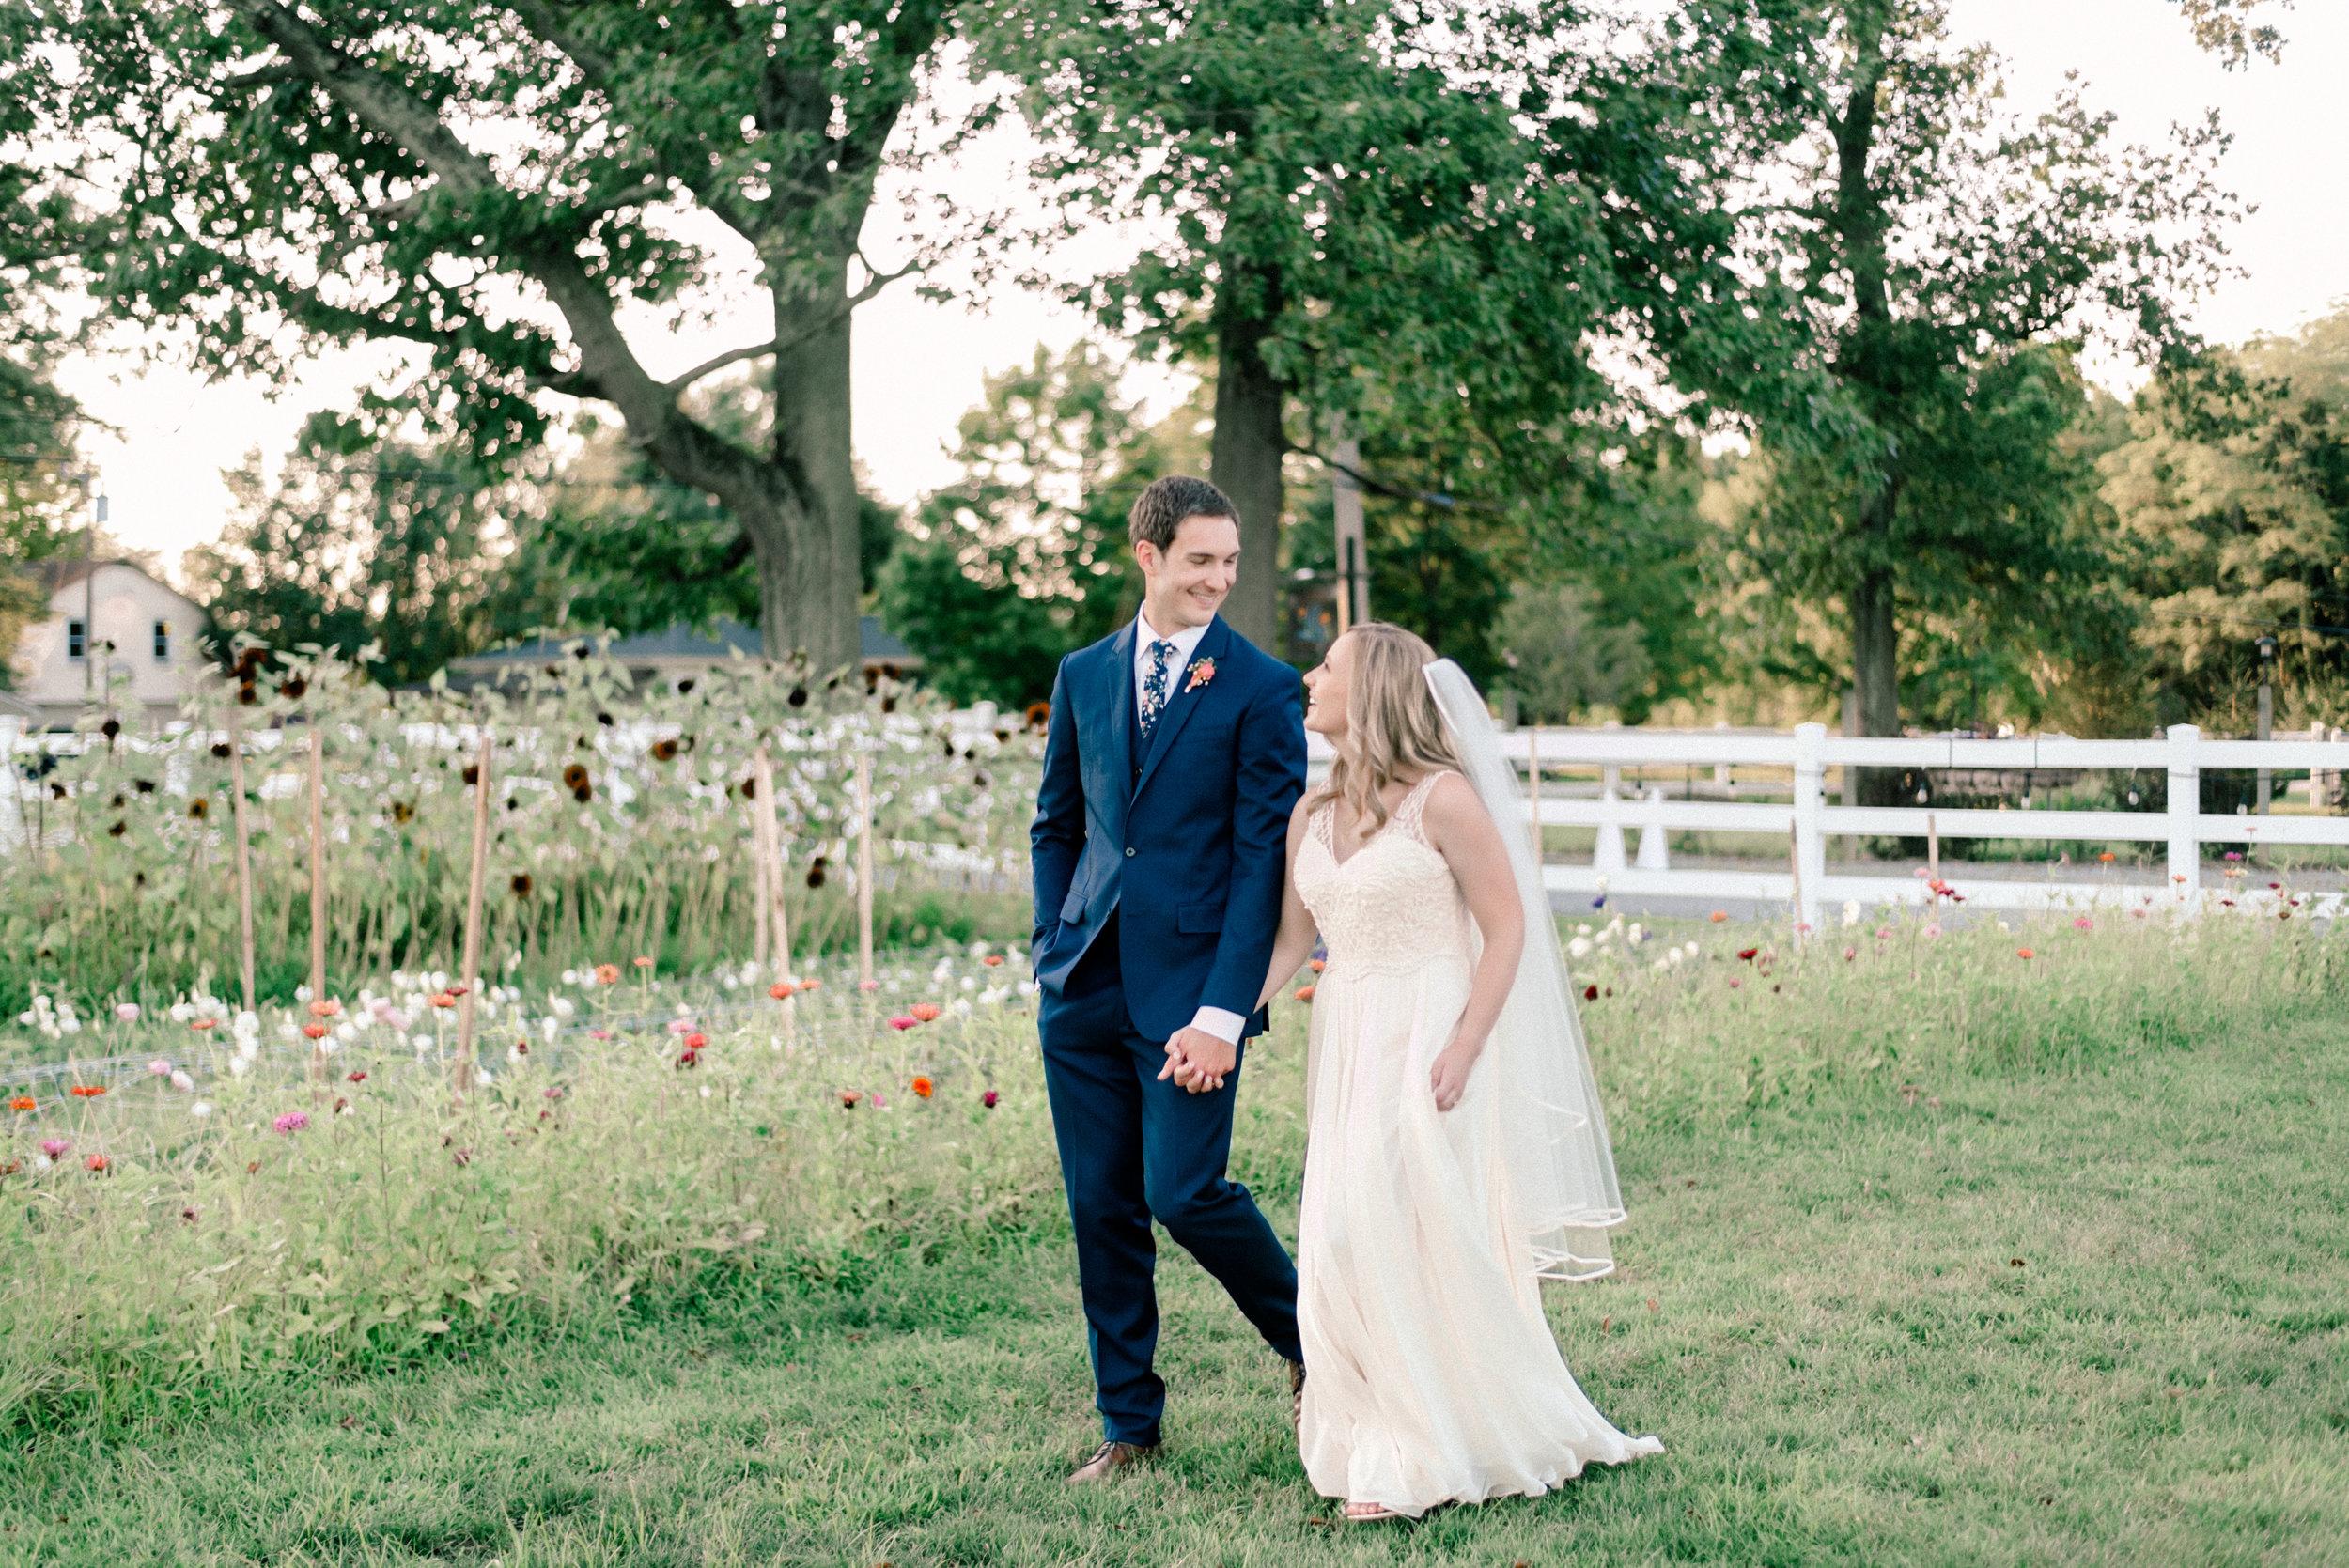 Brideandgroom-Anna+Dan_(36_of_50).jpg